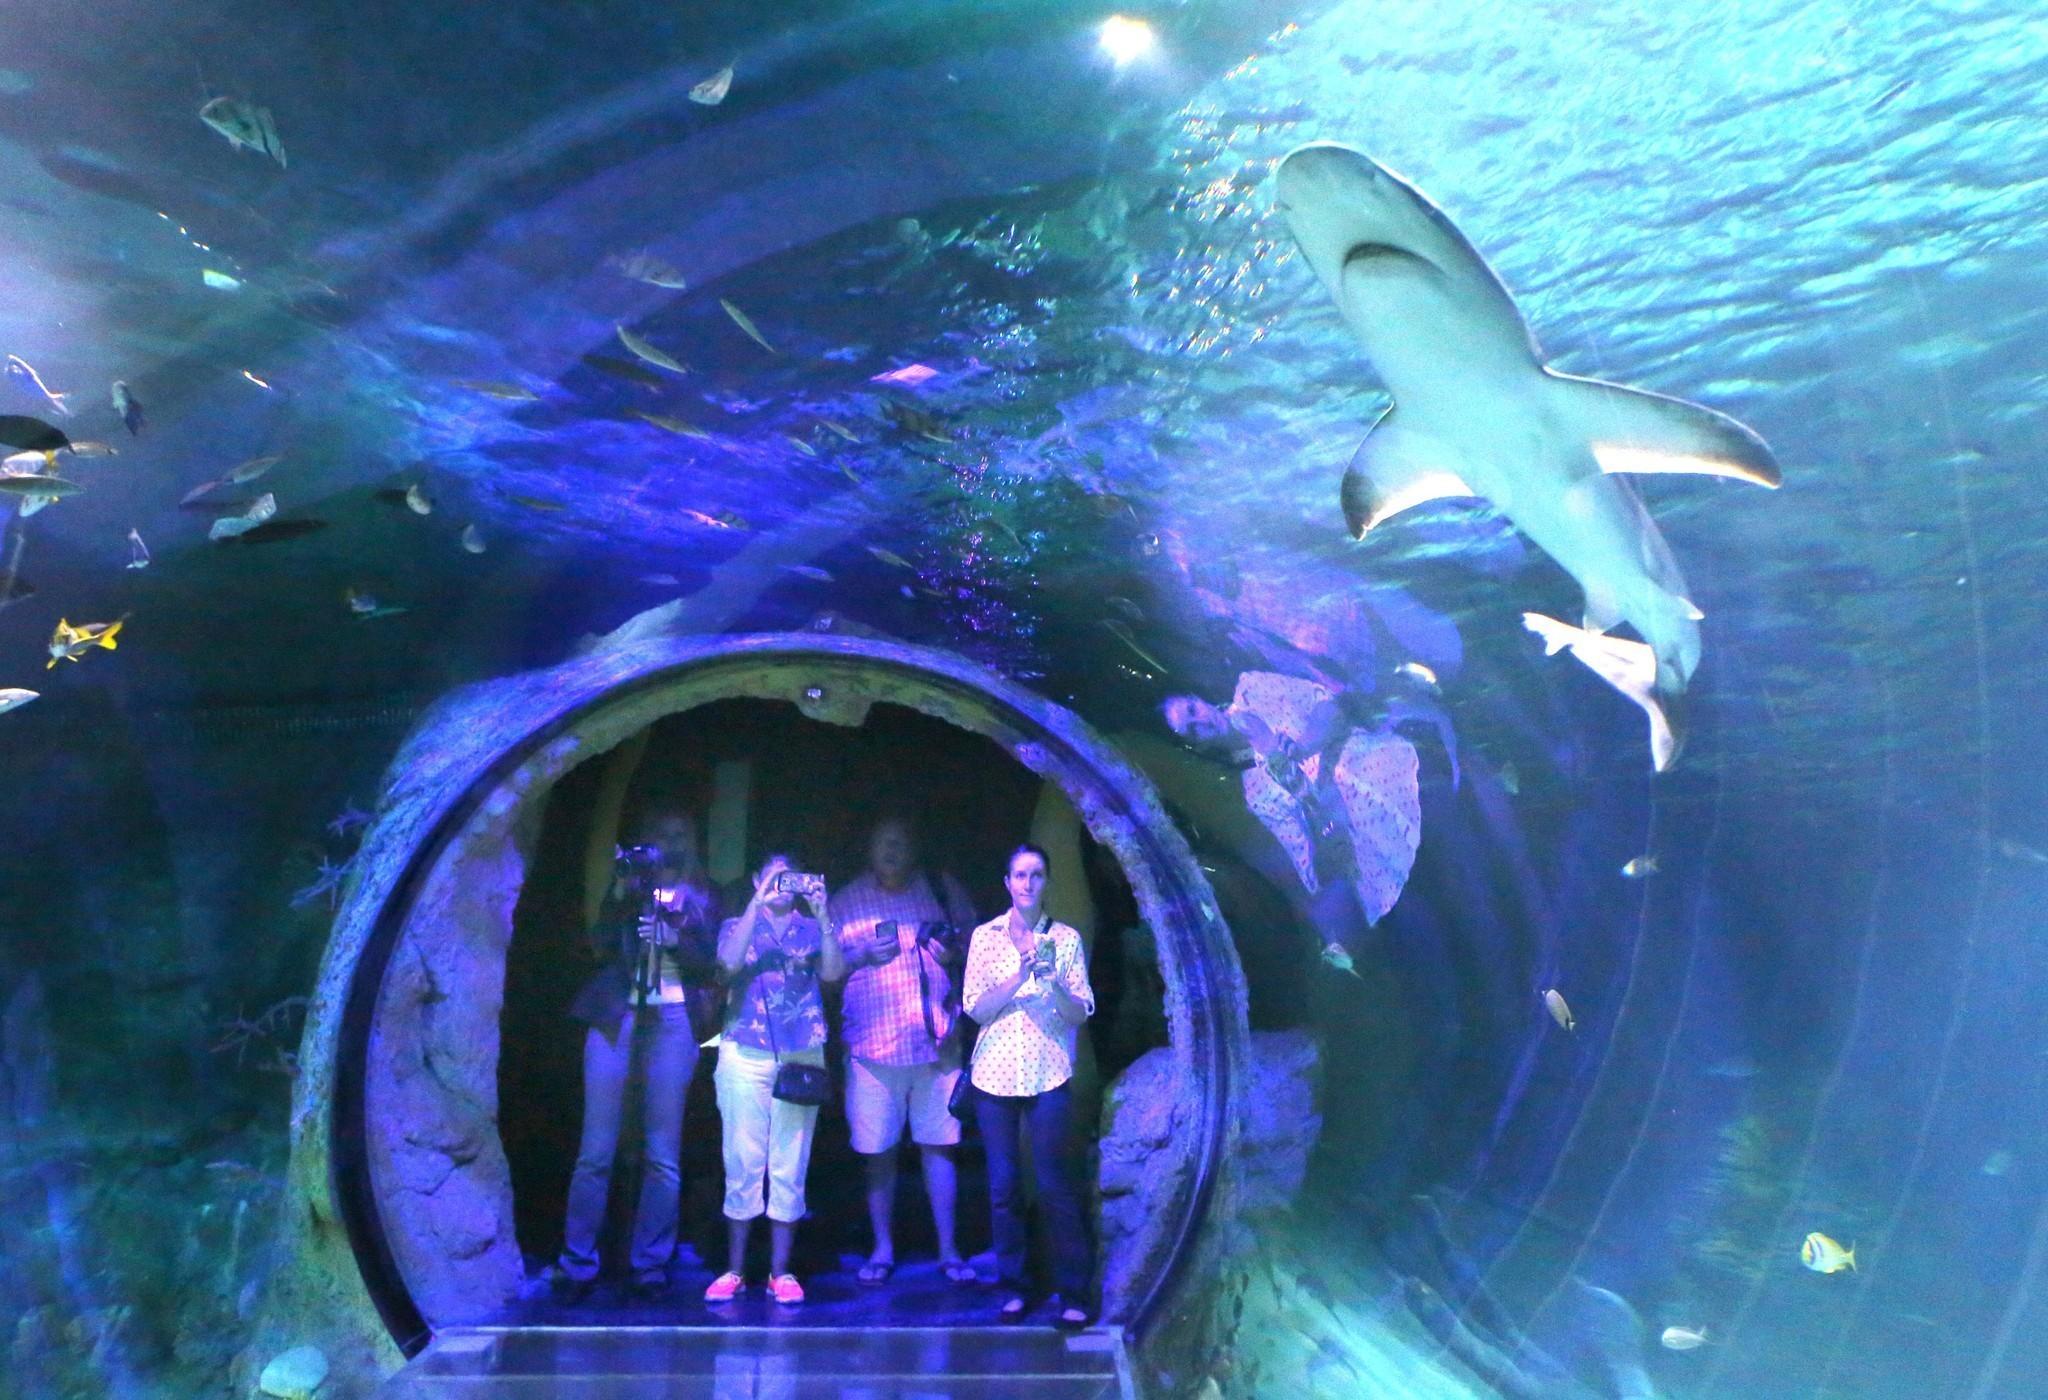 Reviews >> Pictures: Sea Life aquarium at I-Drive 360 - Orlando Sentinel